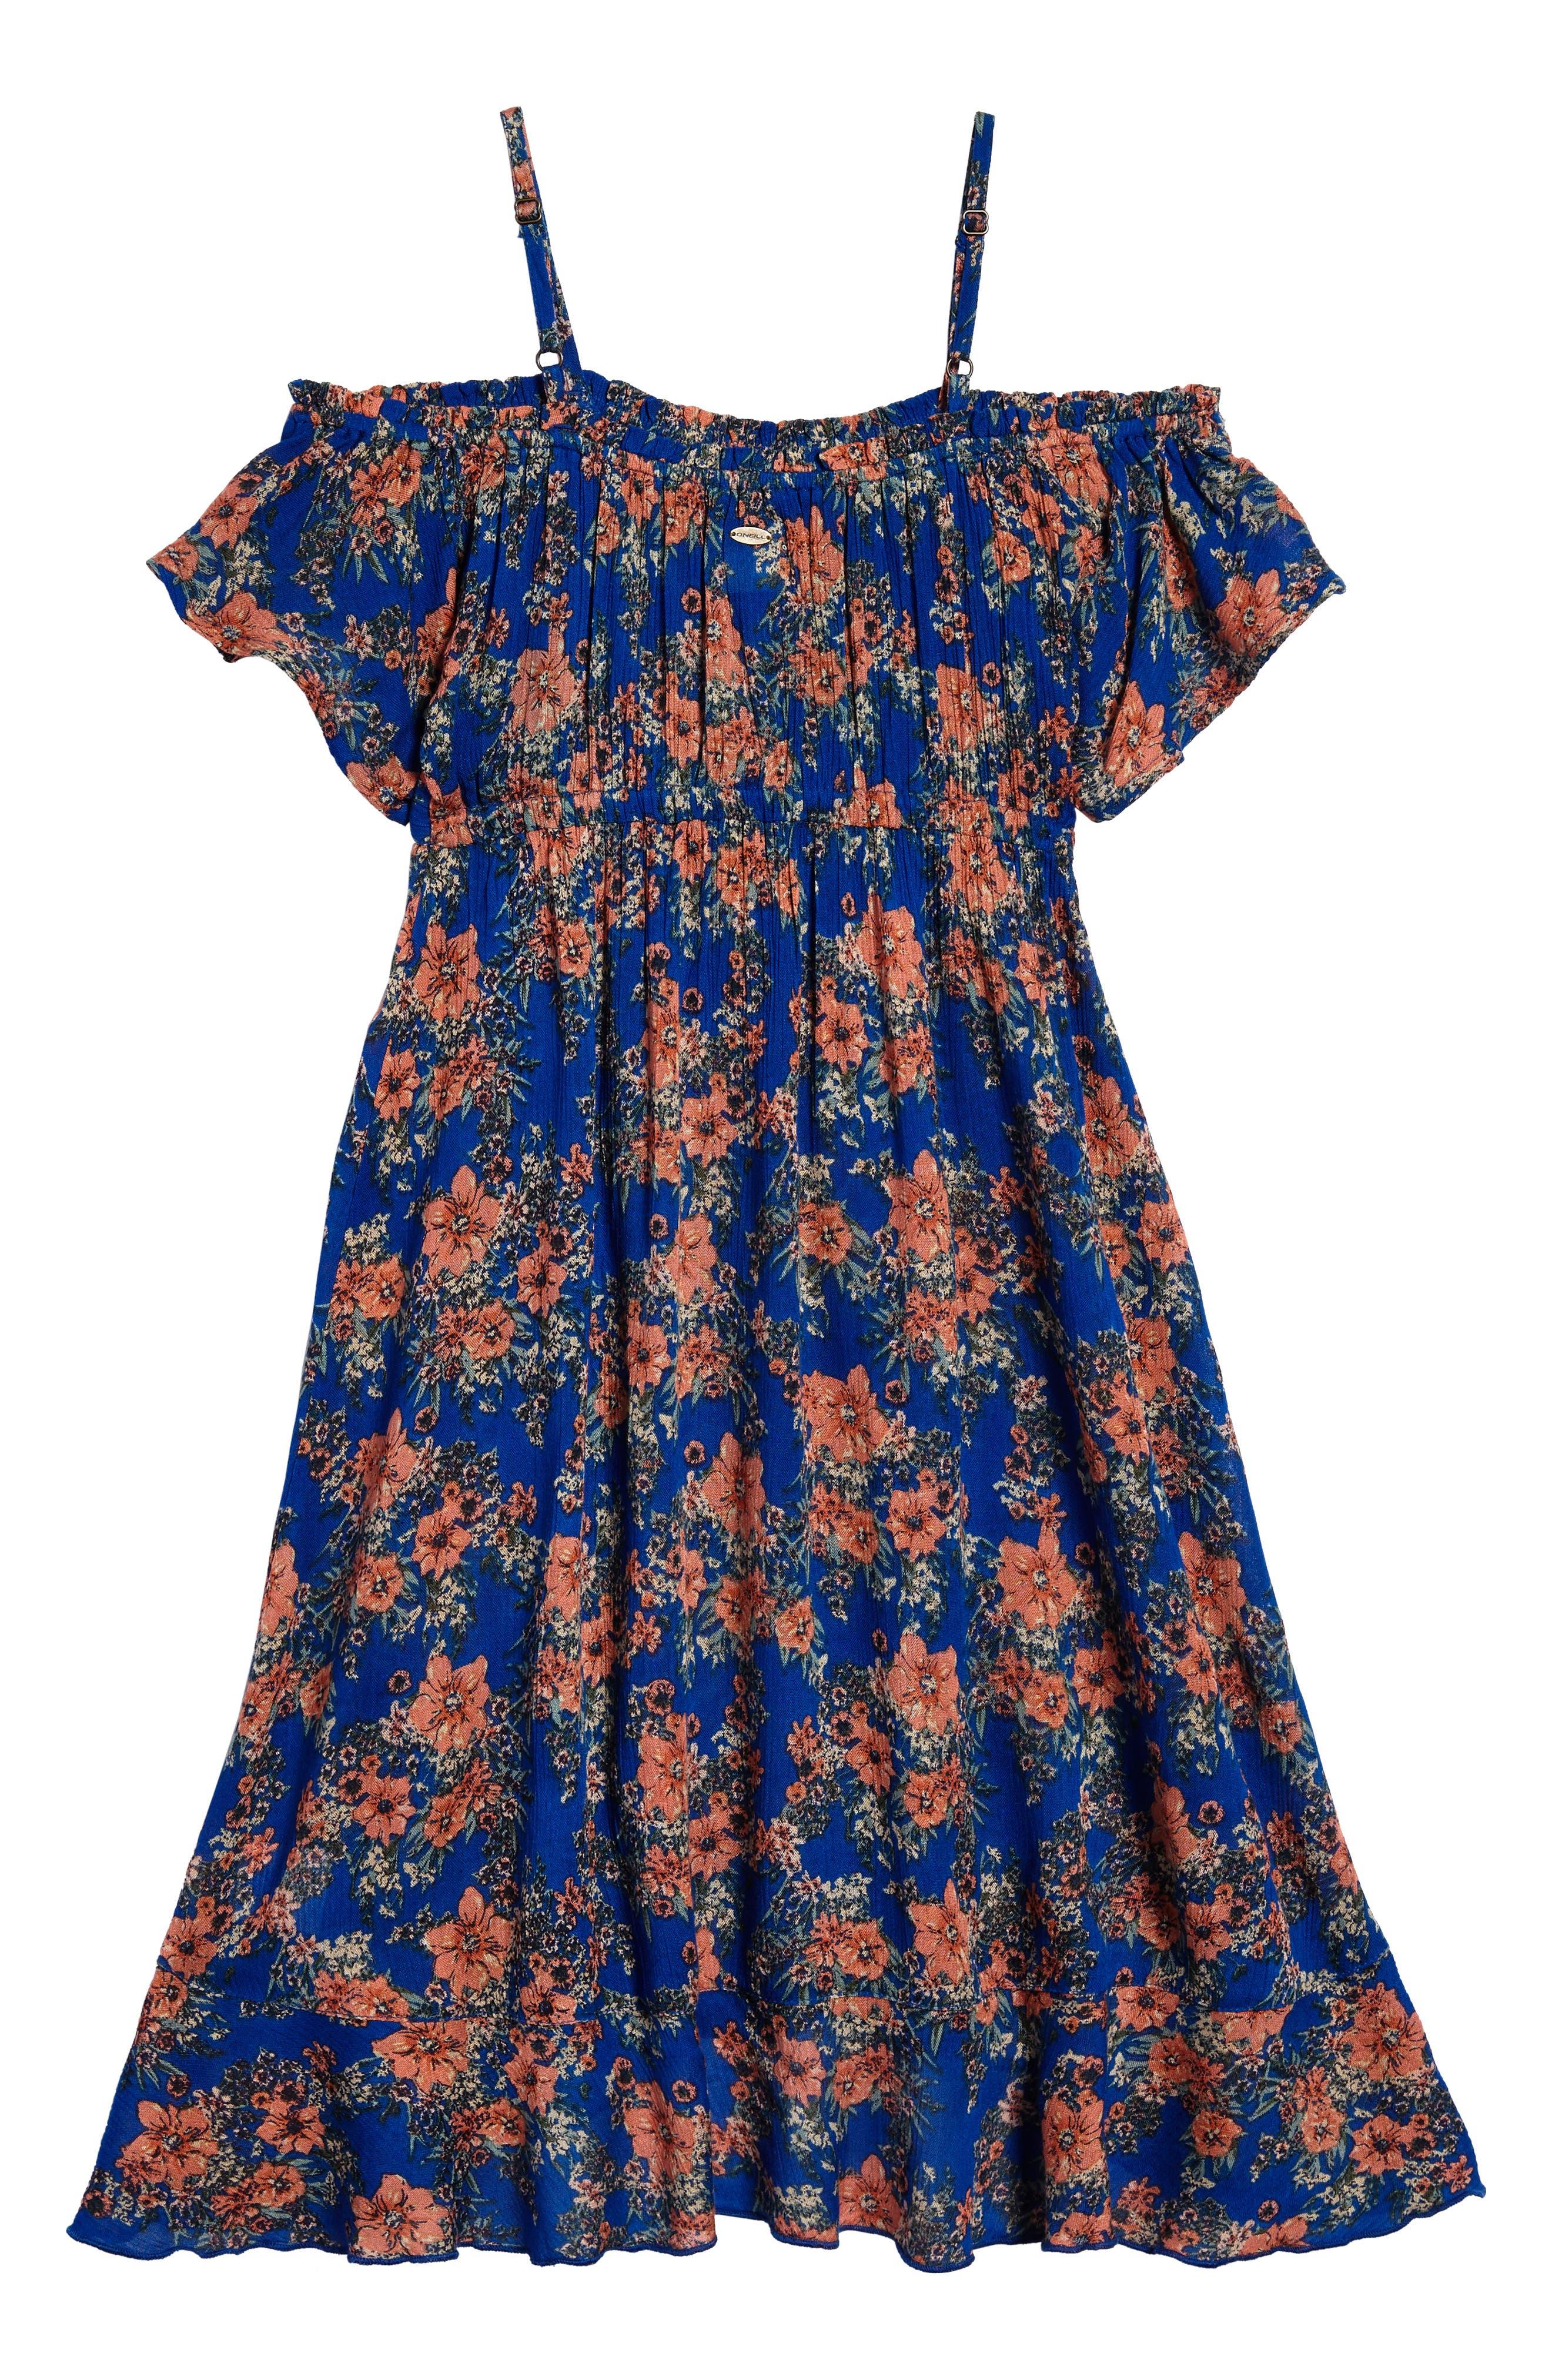 Jackie Off the Shoulder Dress,                             Alternate thumbnail 3, color,